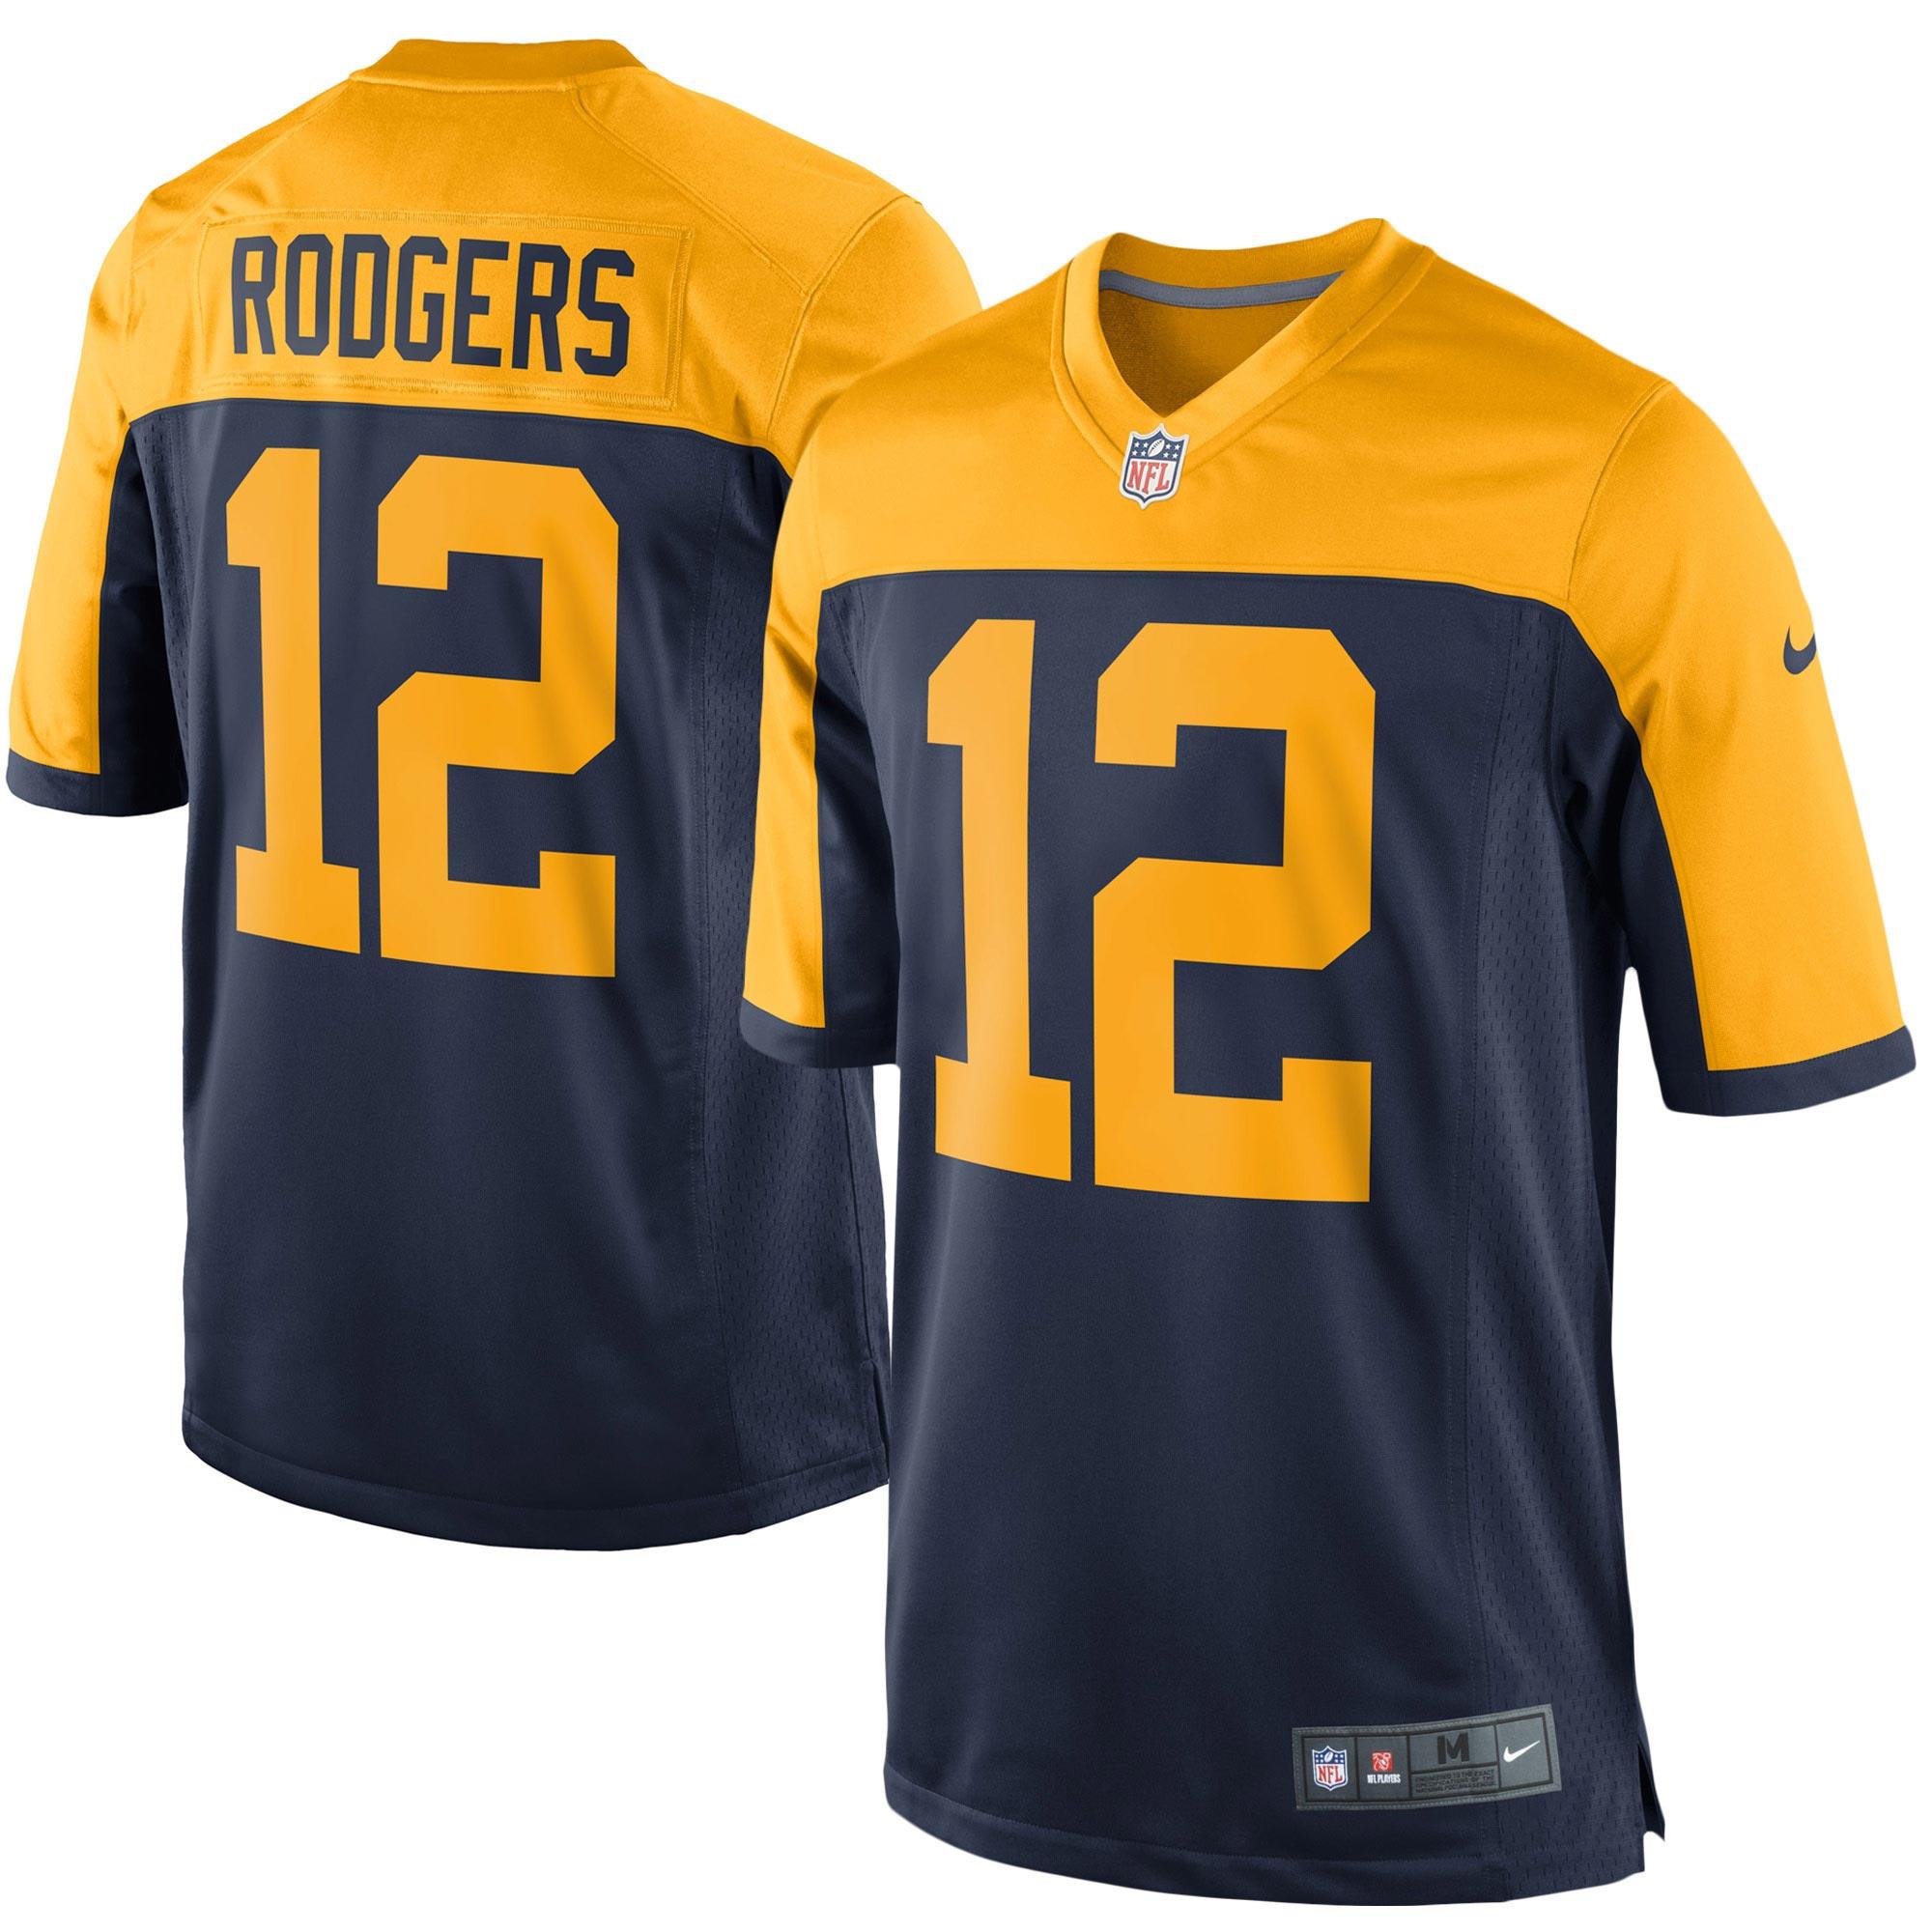 Green Bay Packers Ausweichtrikot - Aaron Rodgers - Jugendliche